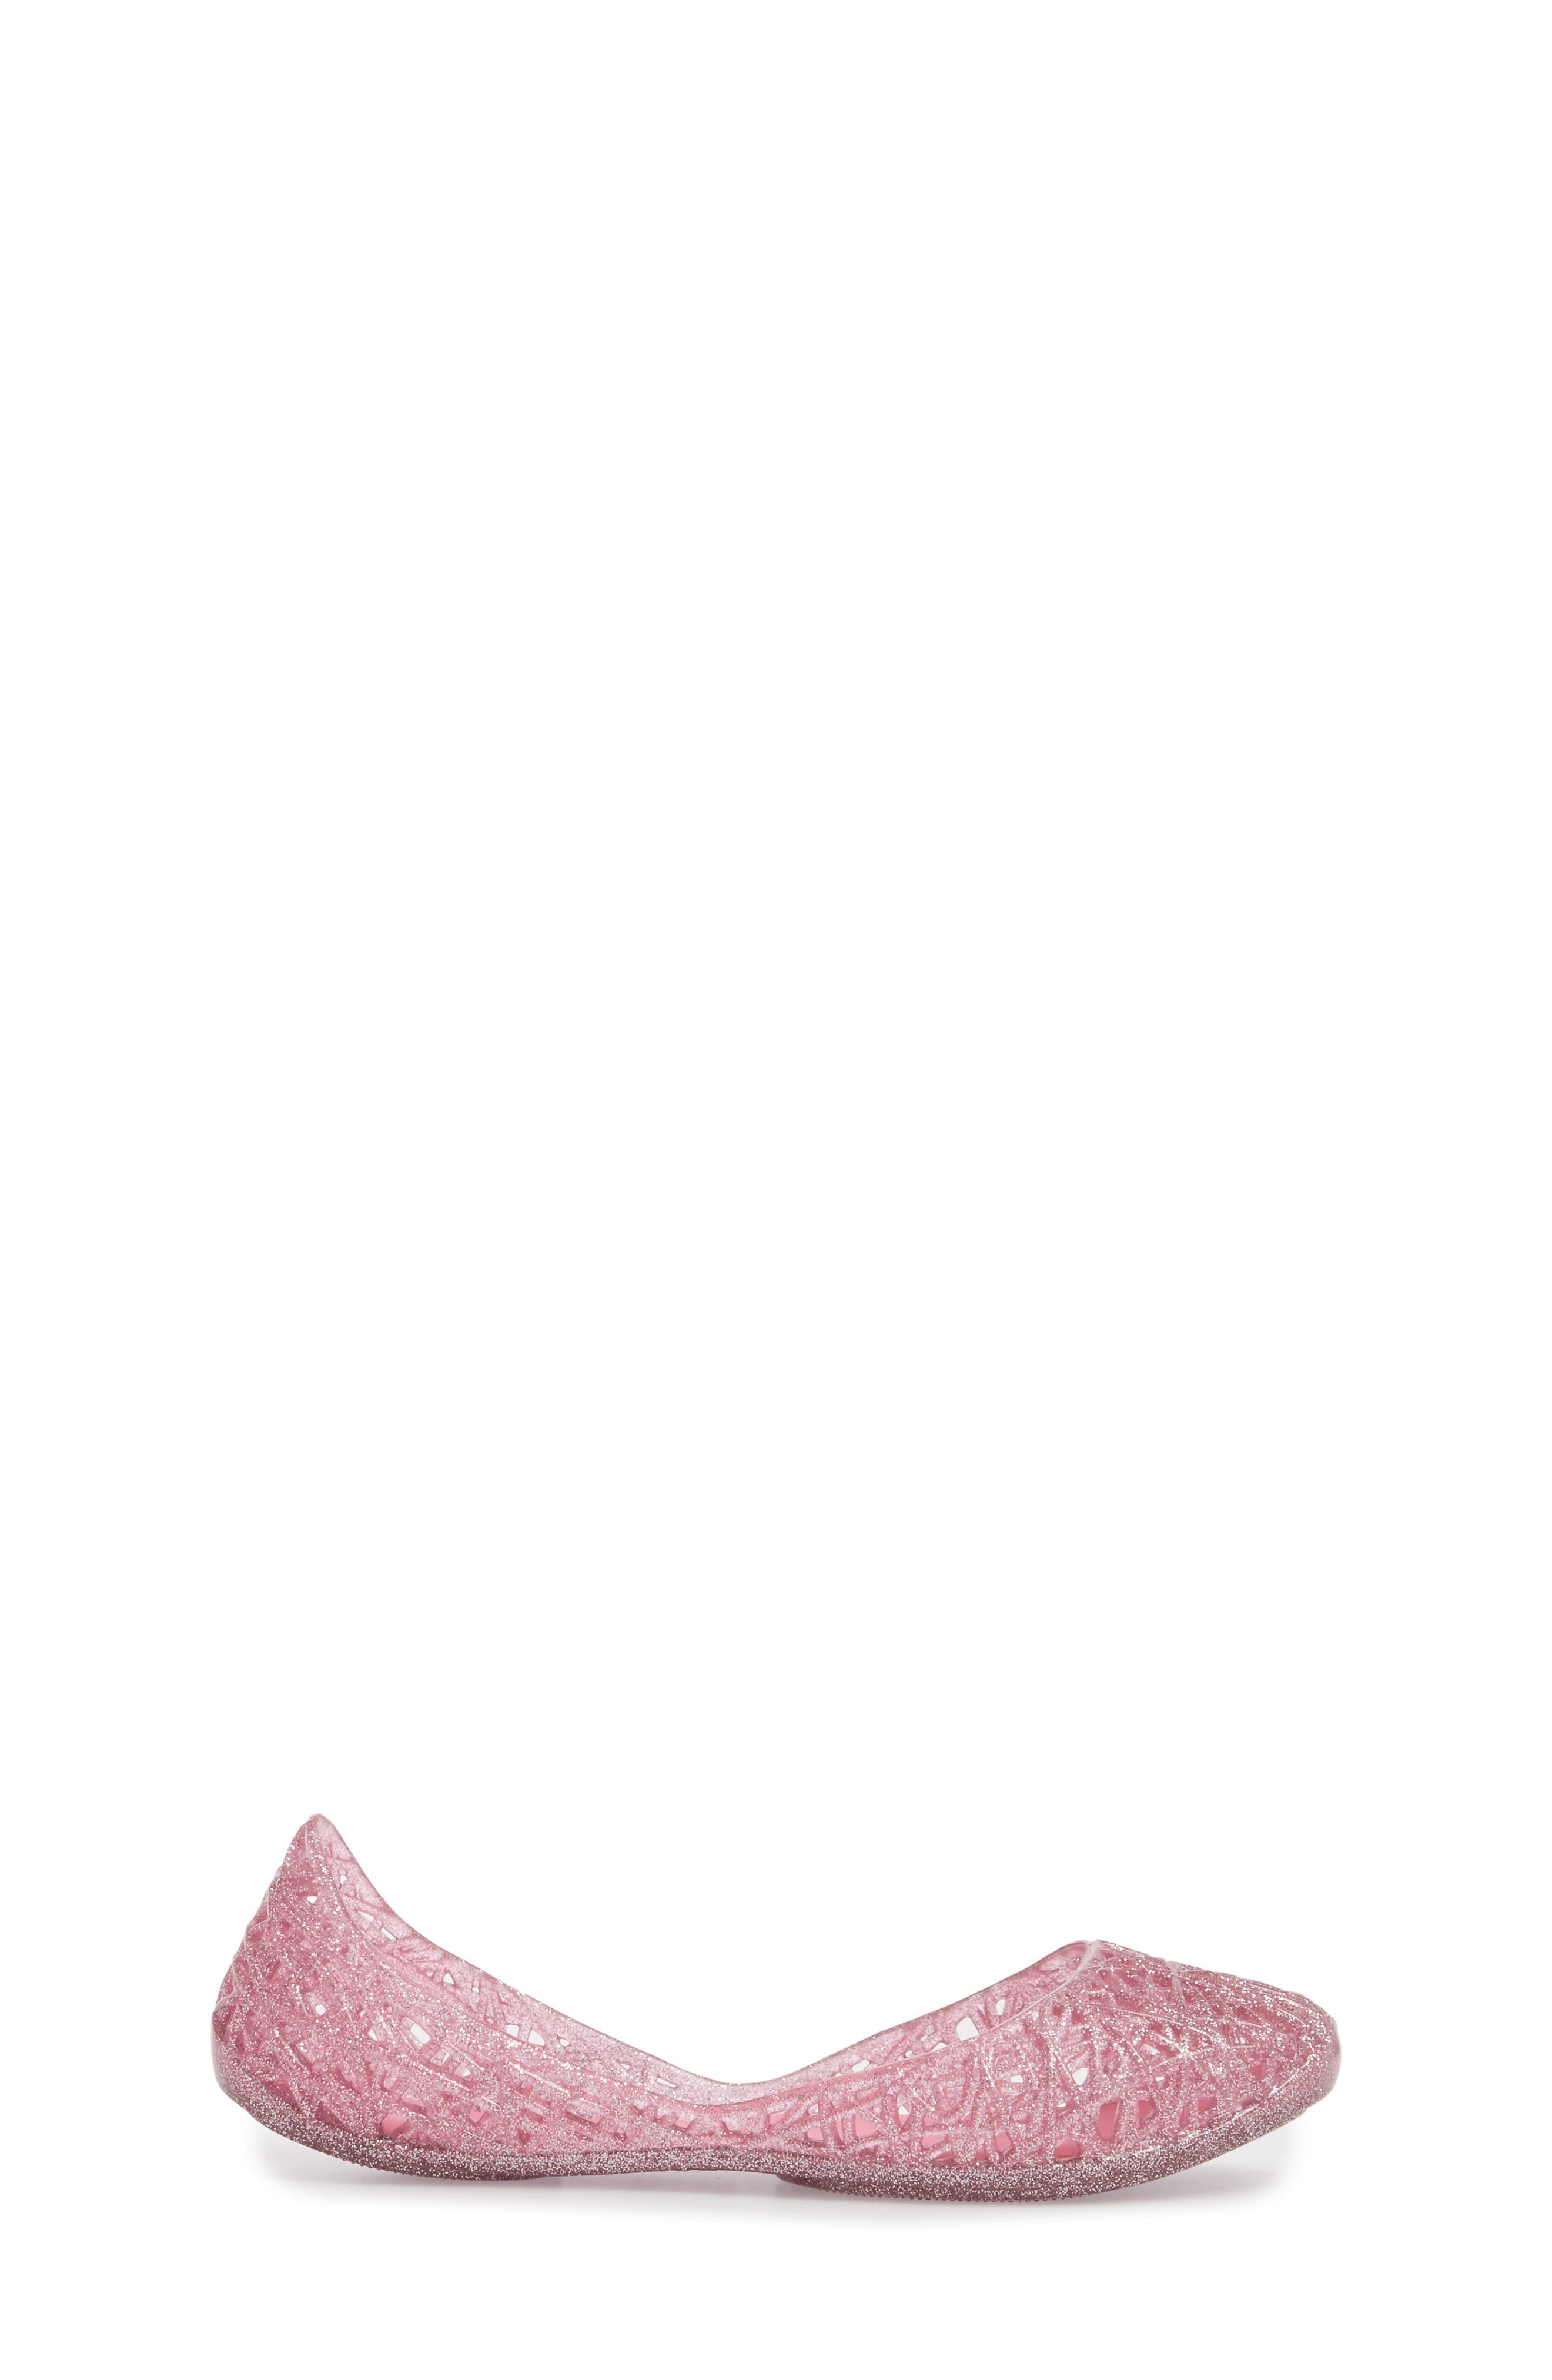 MEL BY MELISSA, 'Campana Zig Zag' Flat, Alternate thumbnail 3, color, PINK CANDY GLITTER